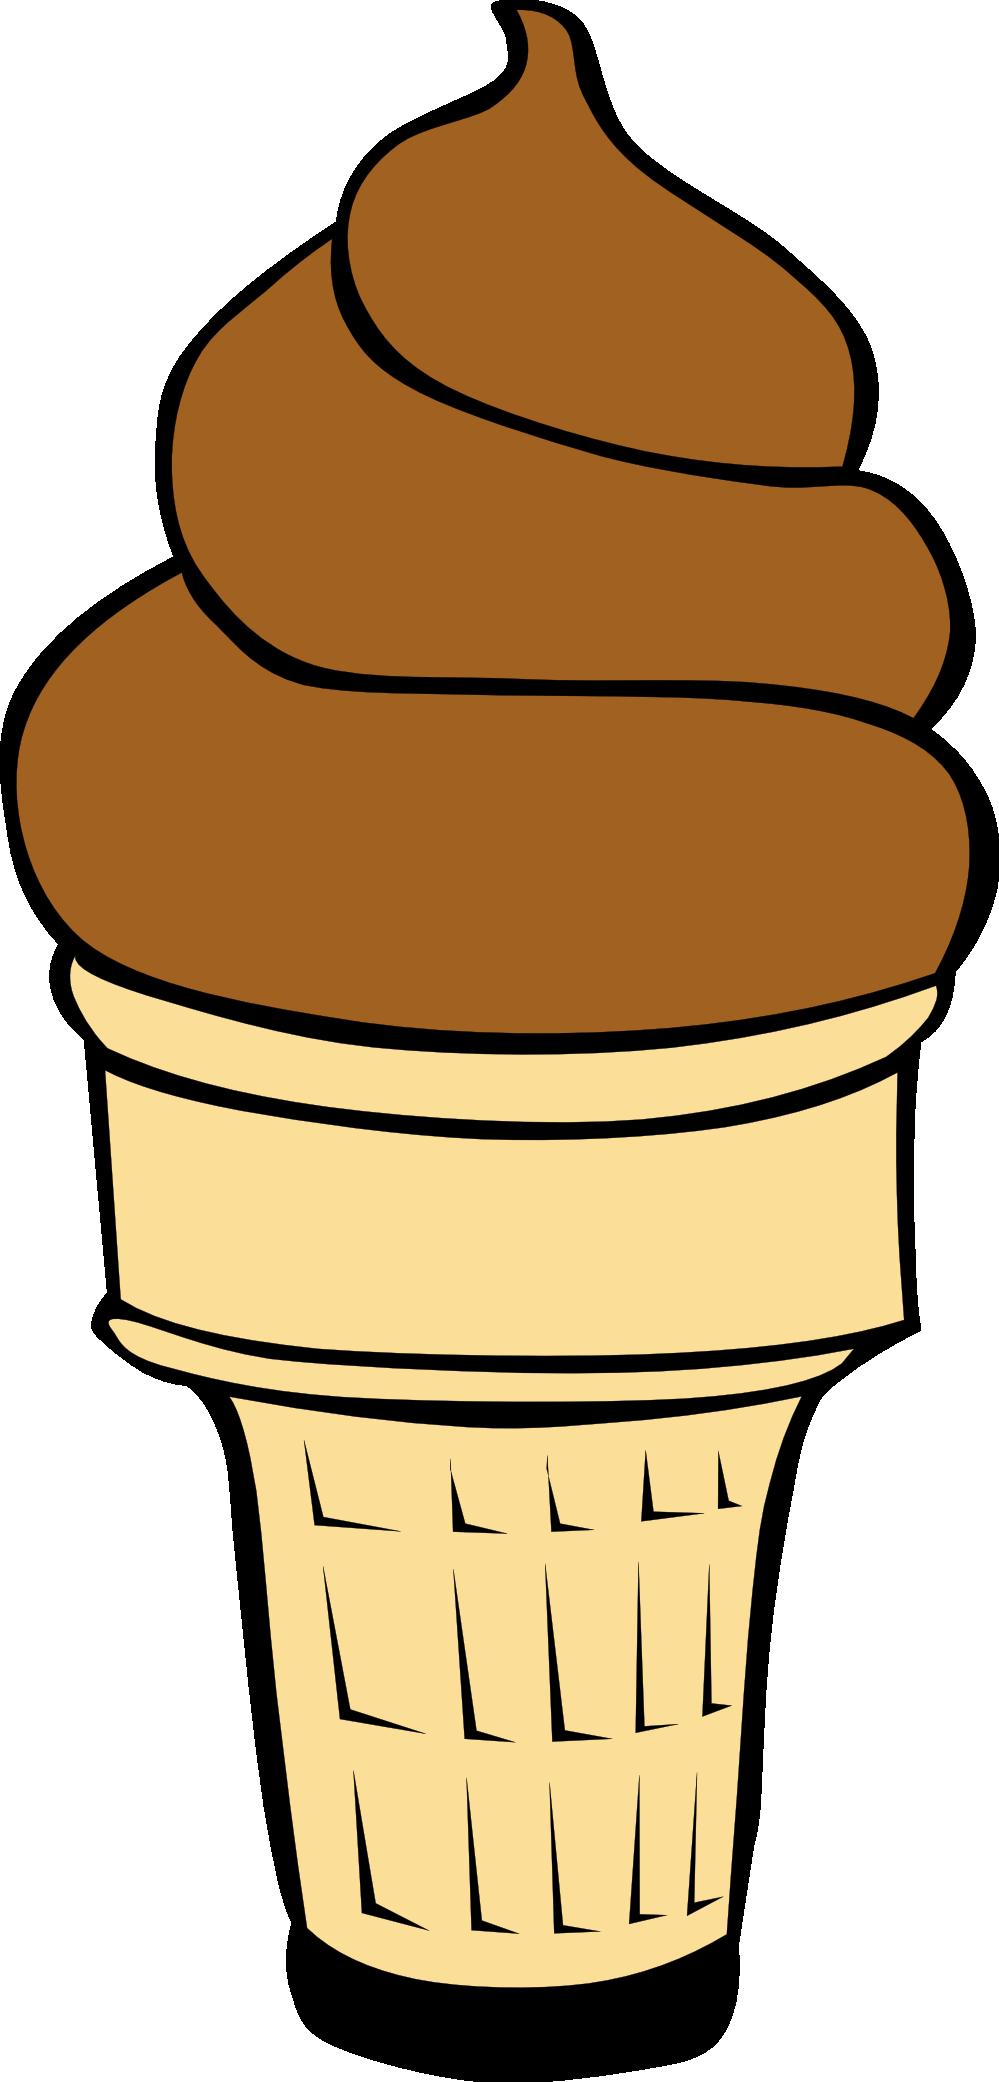 ice cream scoop clipart png